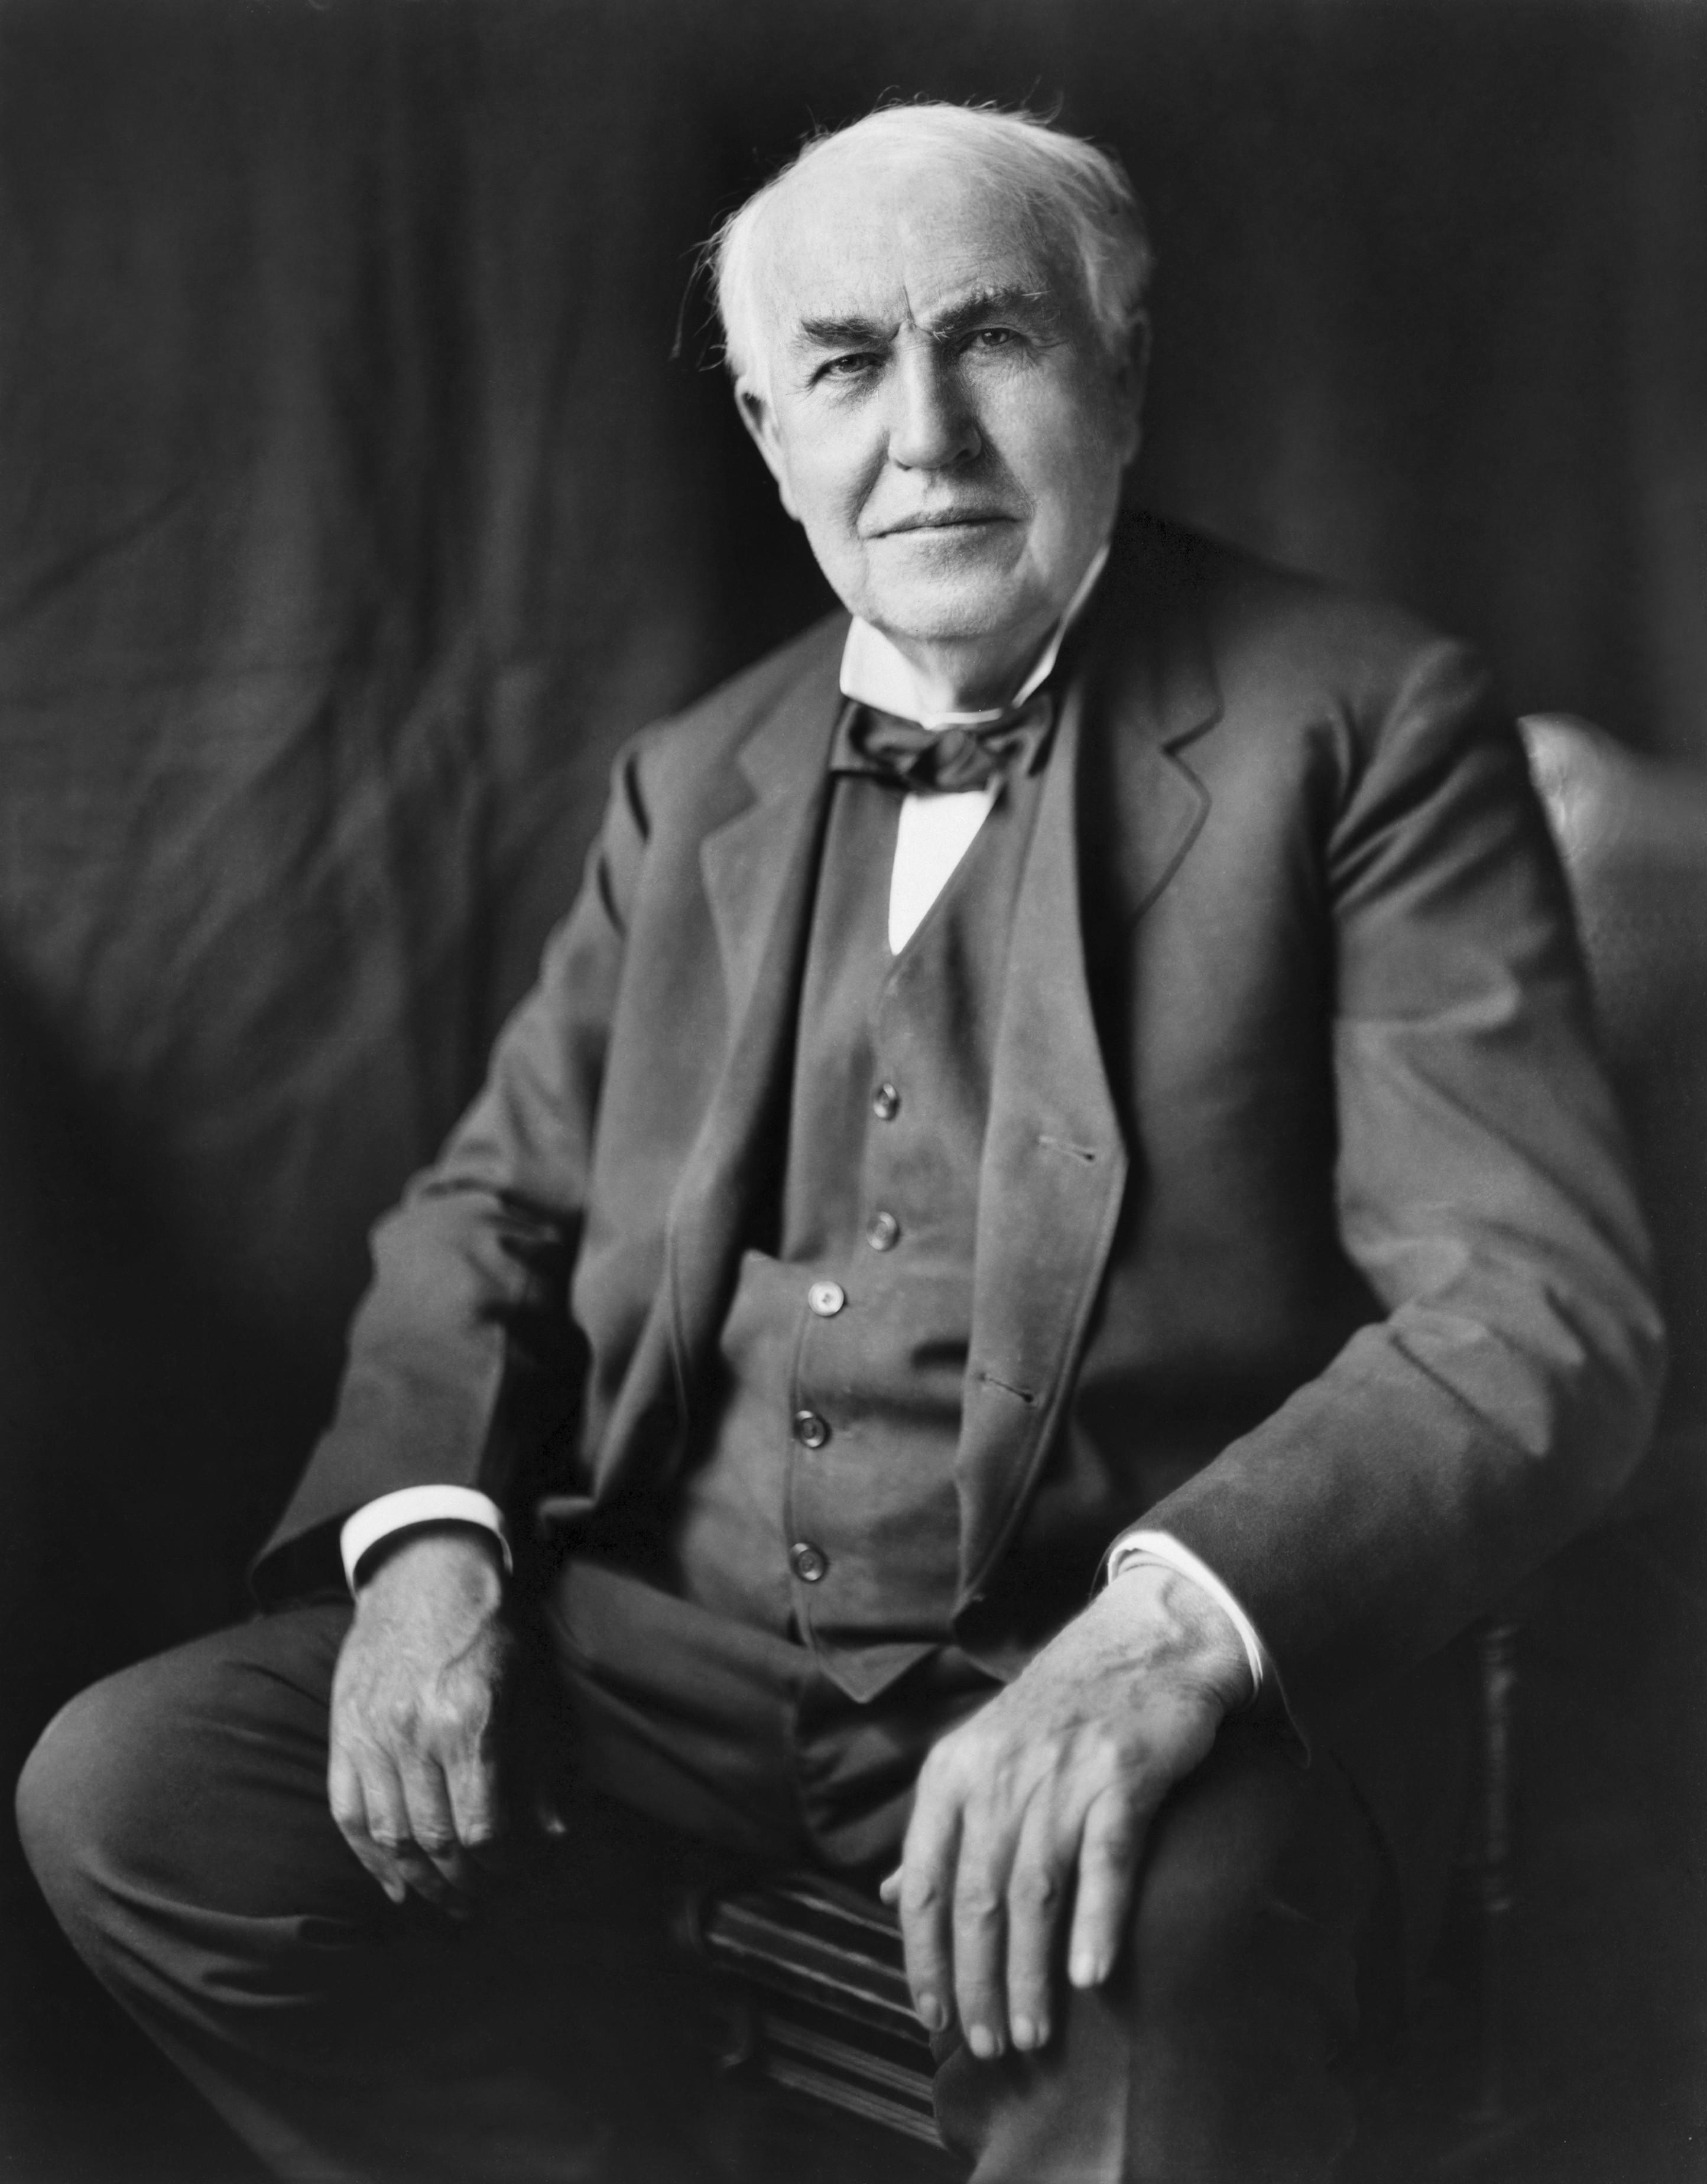 Thomas Edison inventor of electric power generation.